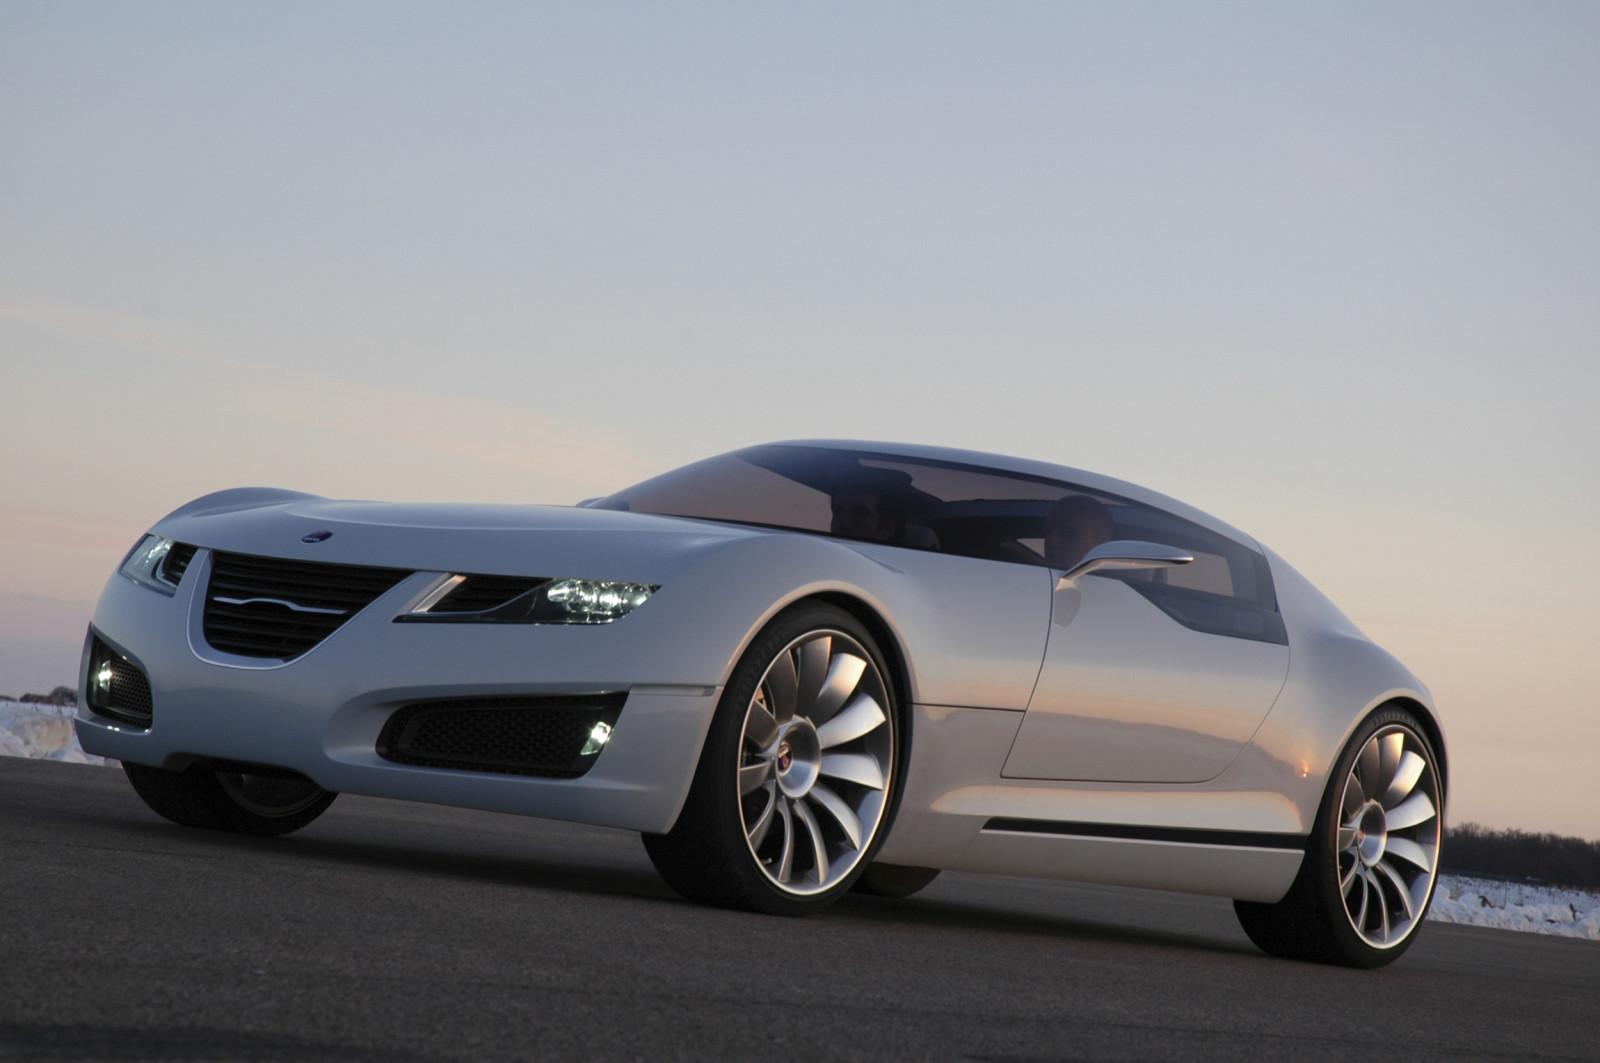 Wallpaper : sports car, coupe, performance car, Sedan, Saab Aero X